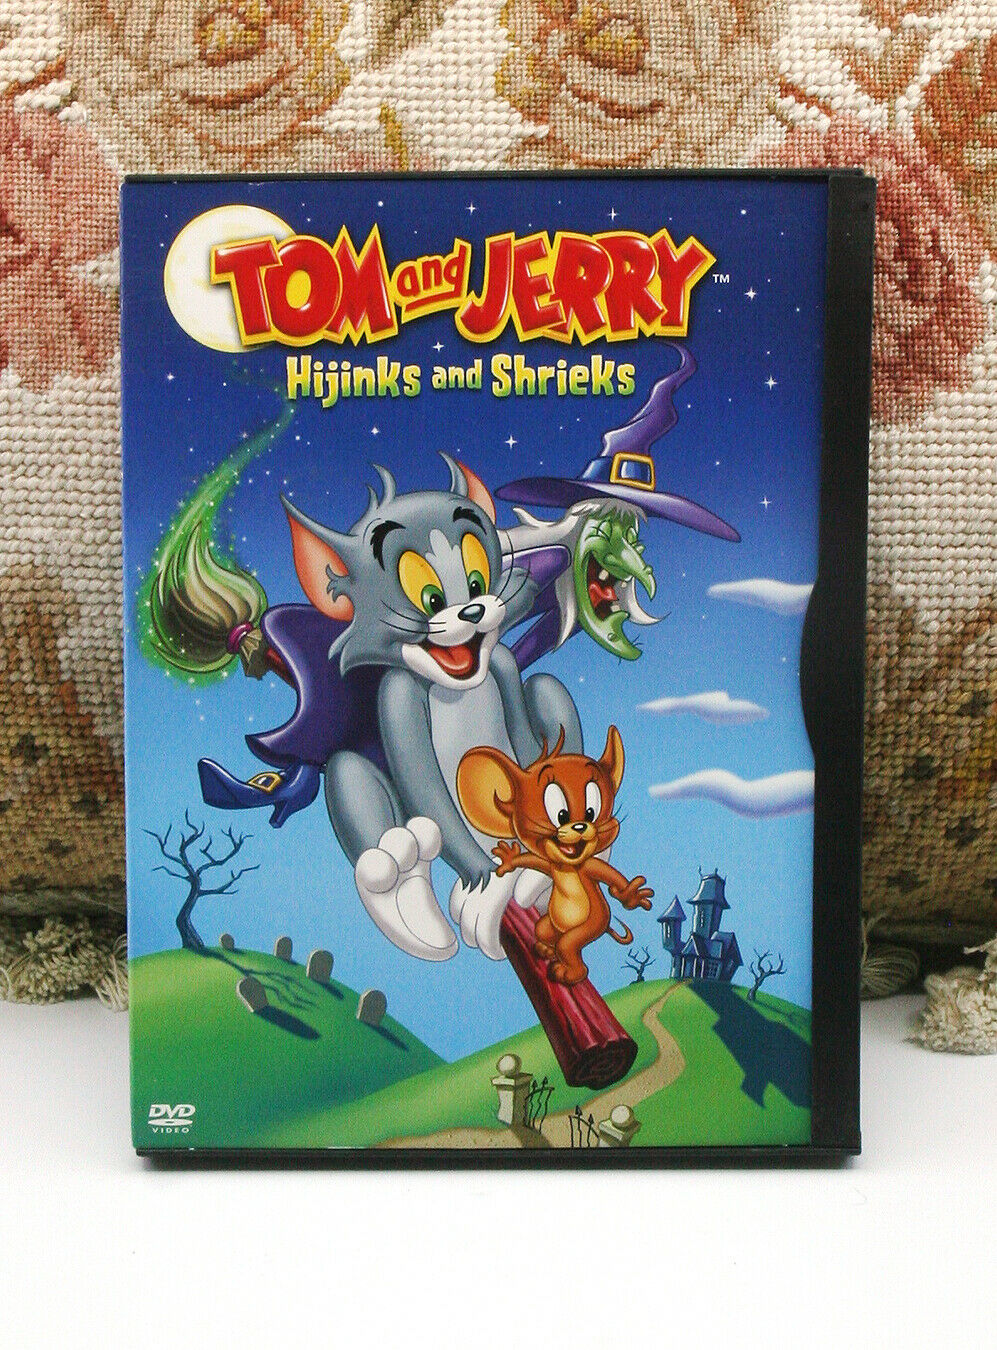 Tom and Jerry: Hijinks and Shrieks (2003 DVD)